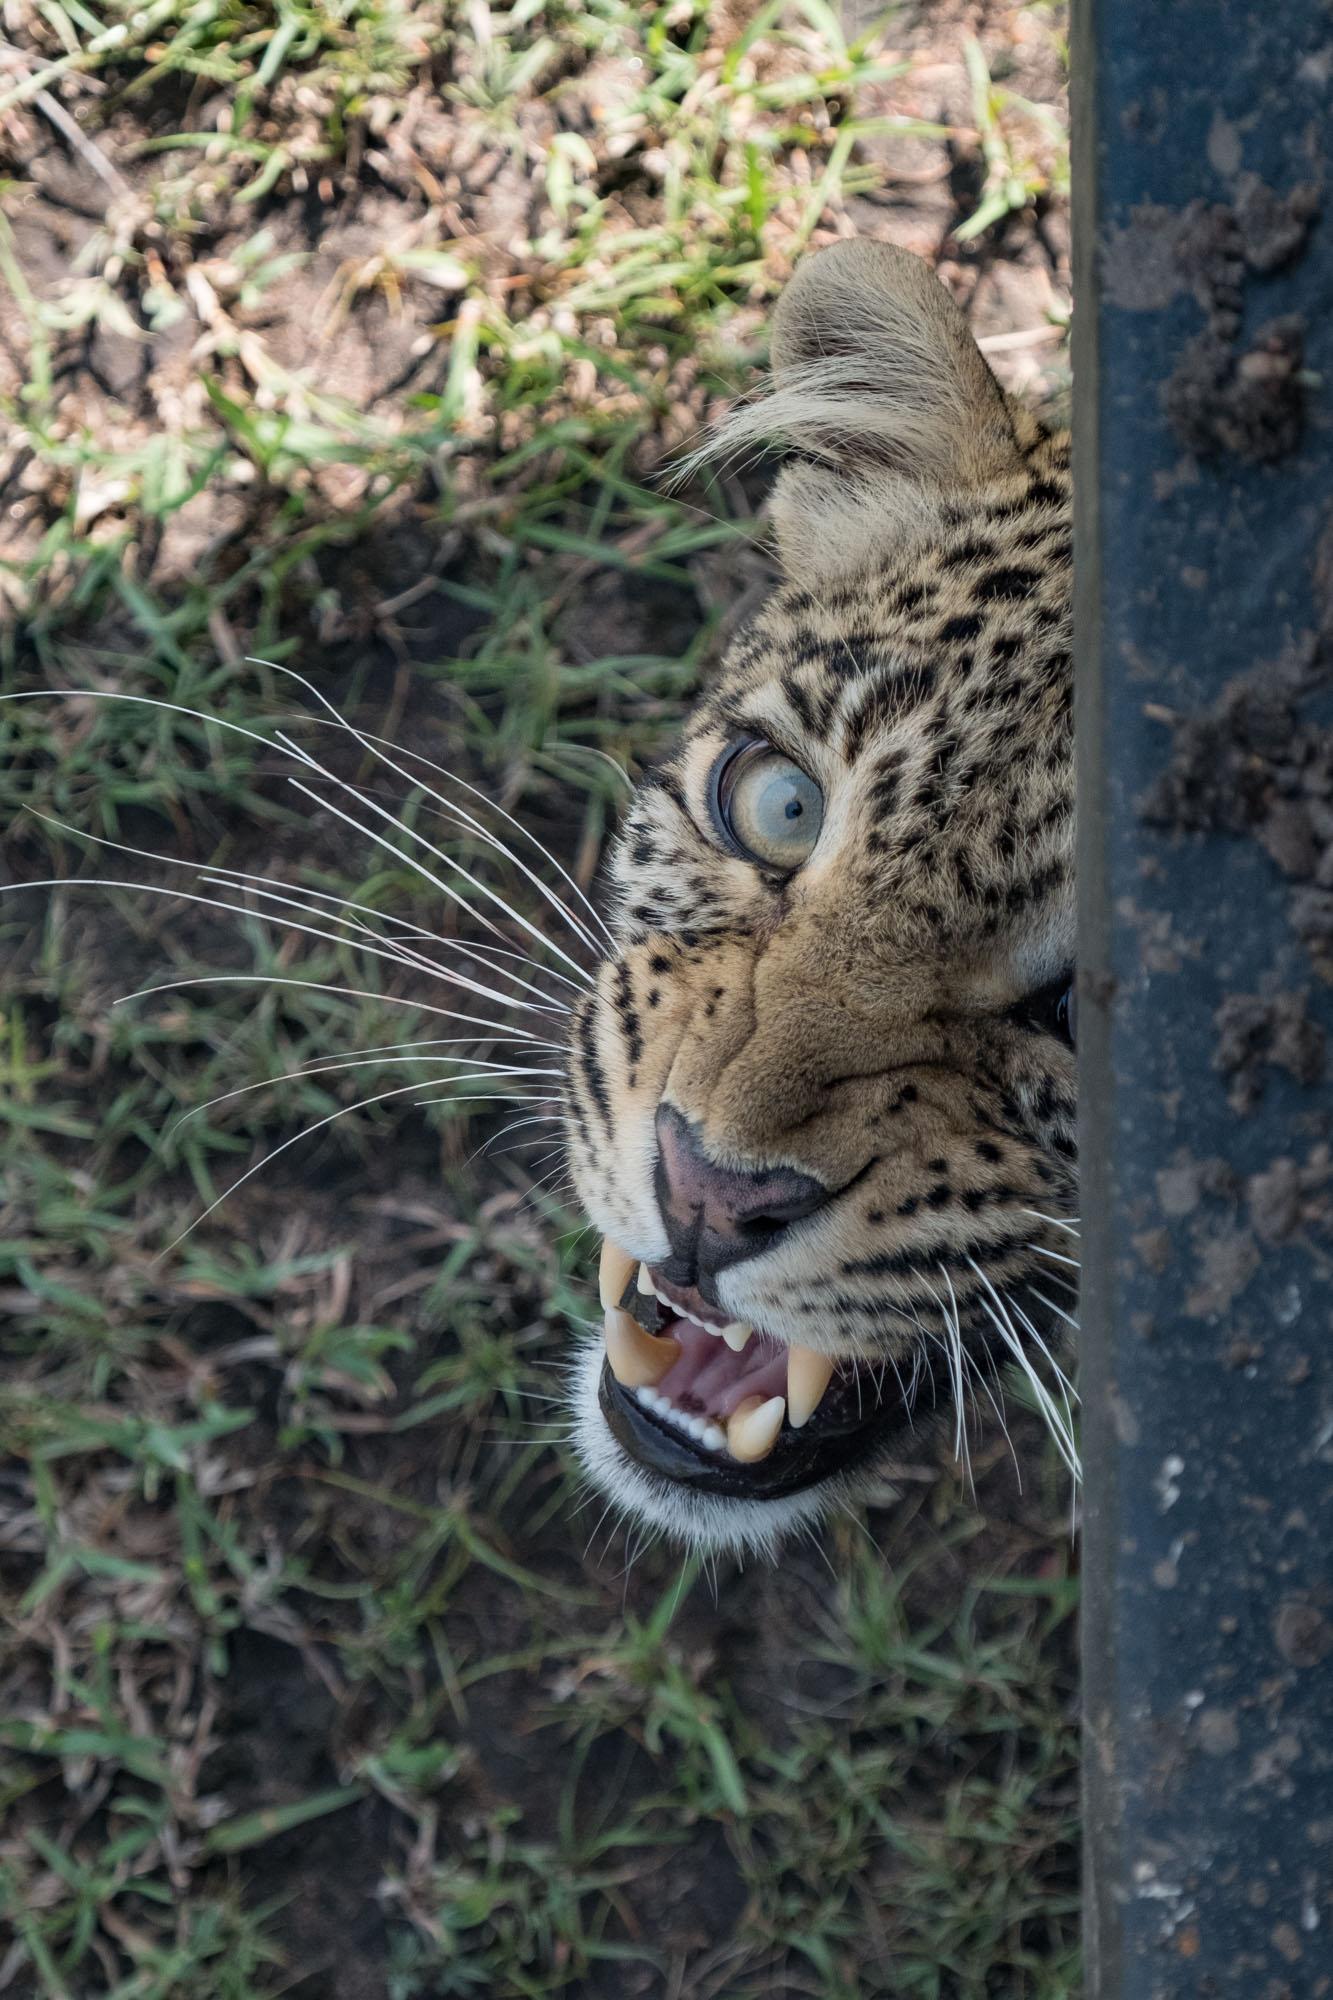 fig-leopard-closeup-eye-to-eye-mara-kenya-2018-01-14.jpg